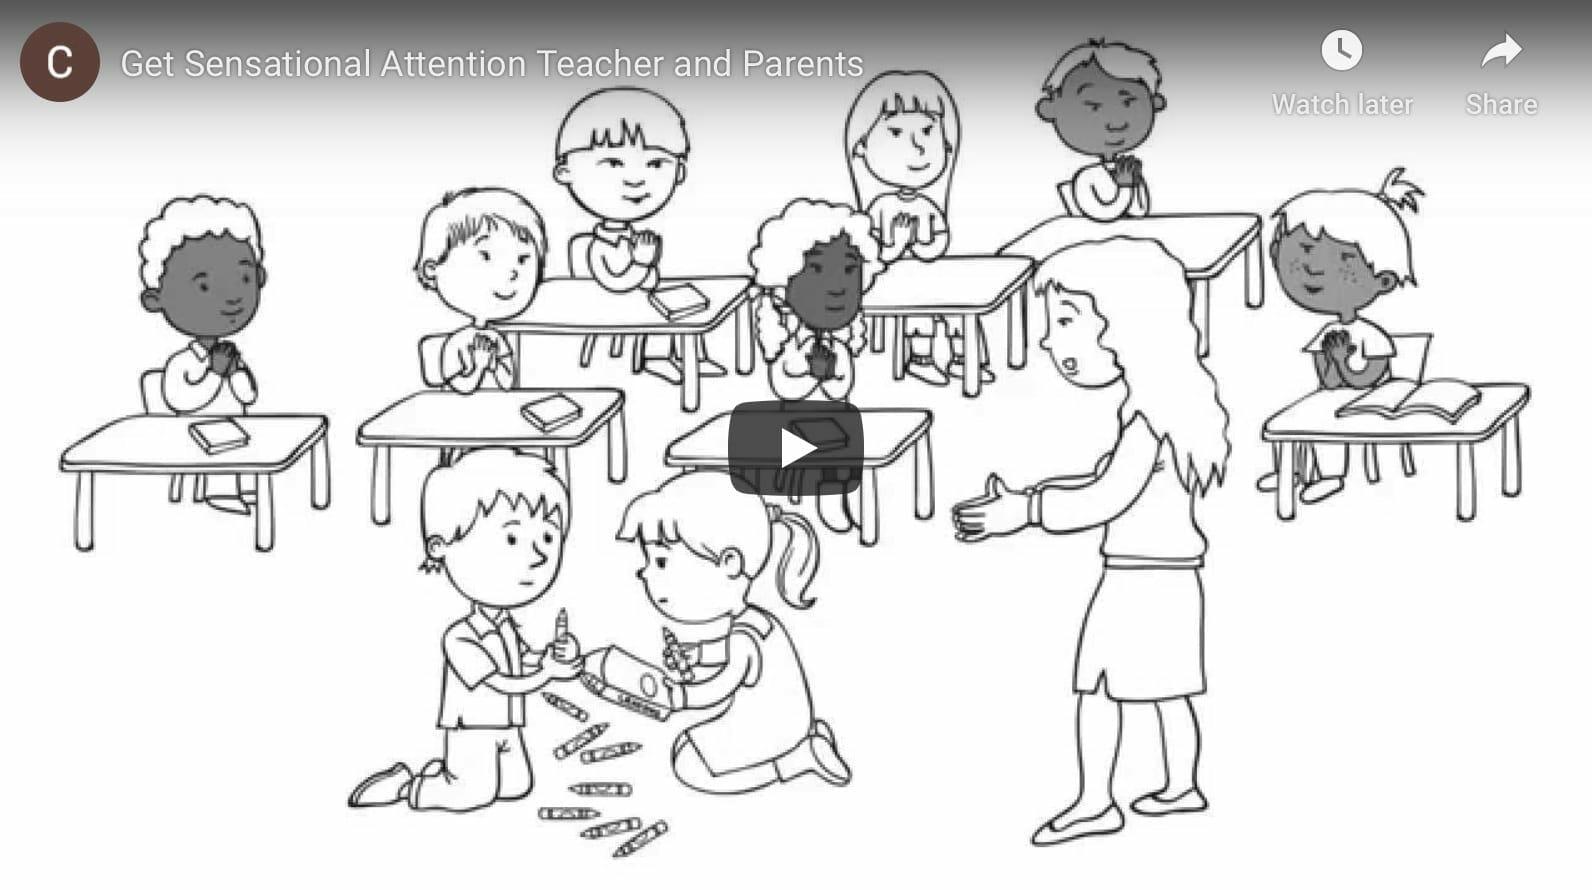 Get Sensational Attention Video